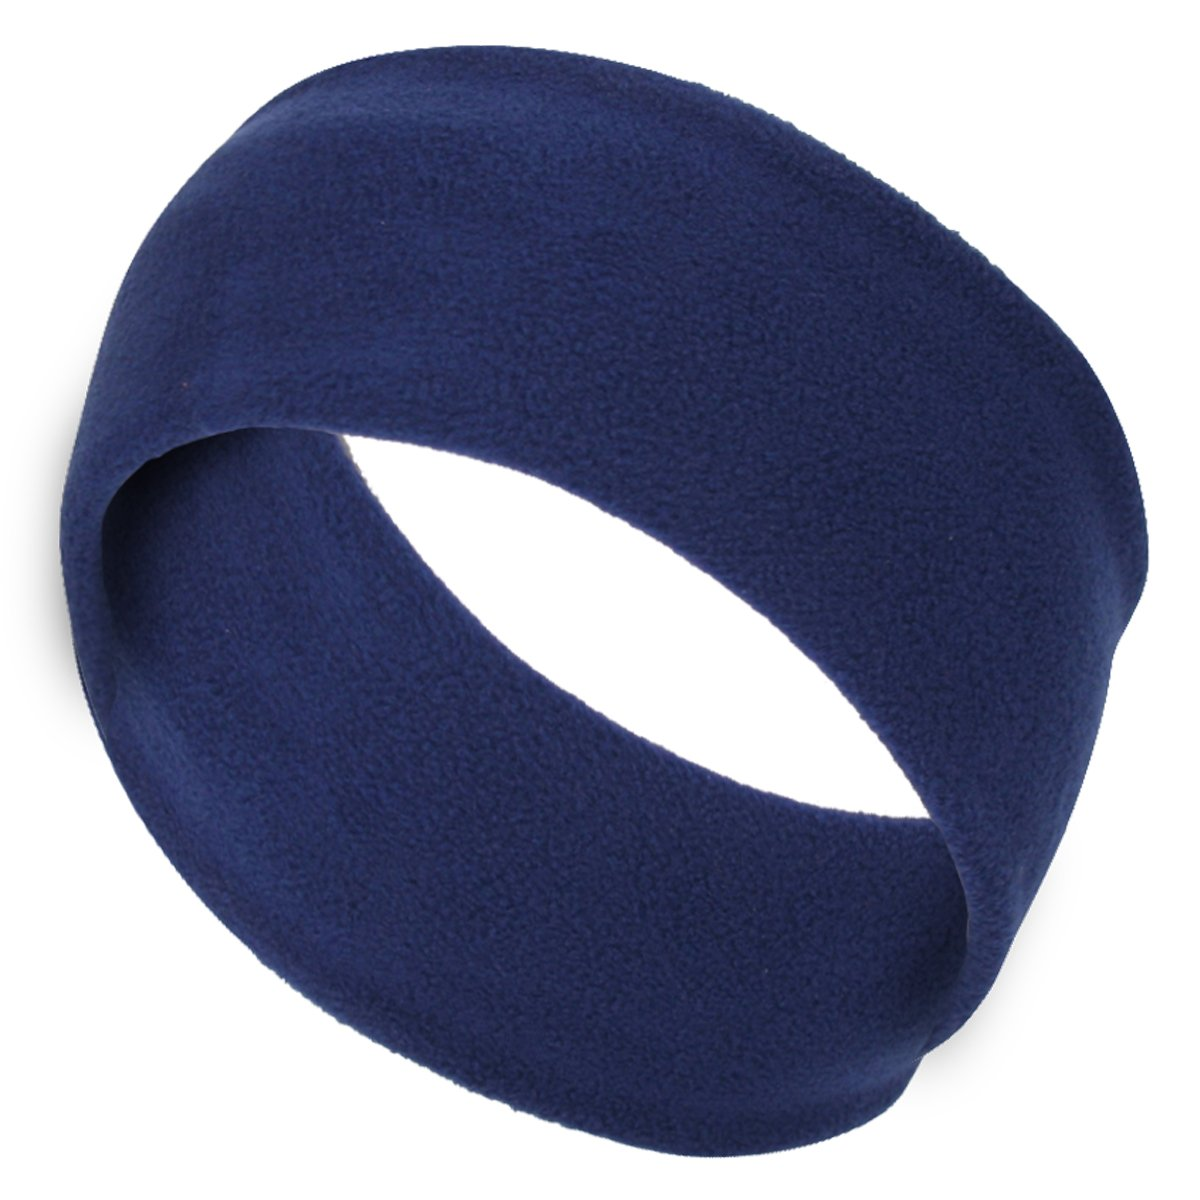 Urban Boundaries Women's Double Layer Micro-Fleece Headband